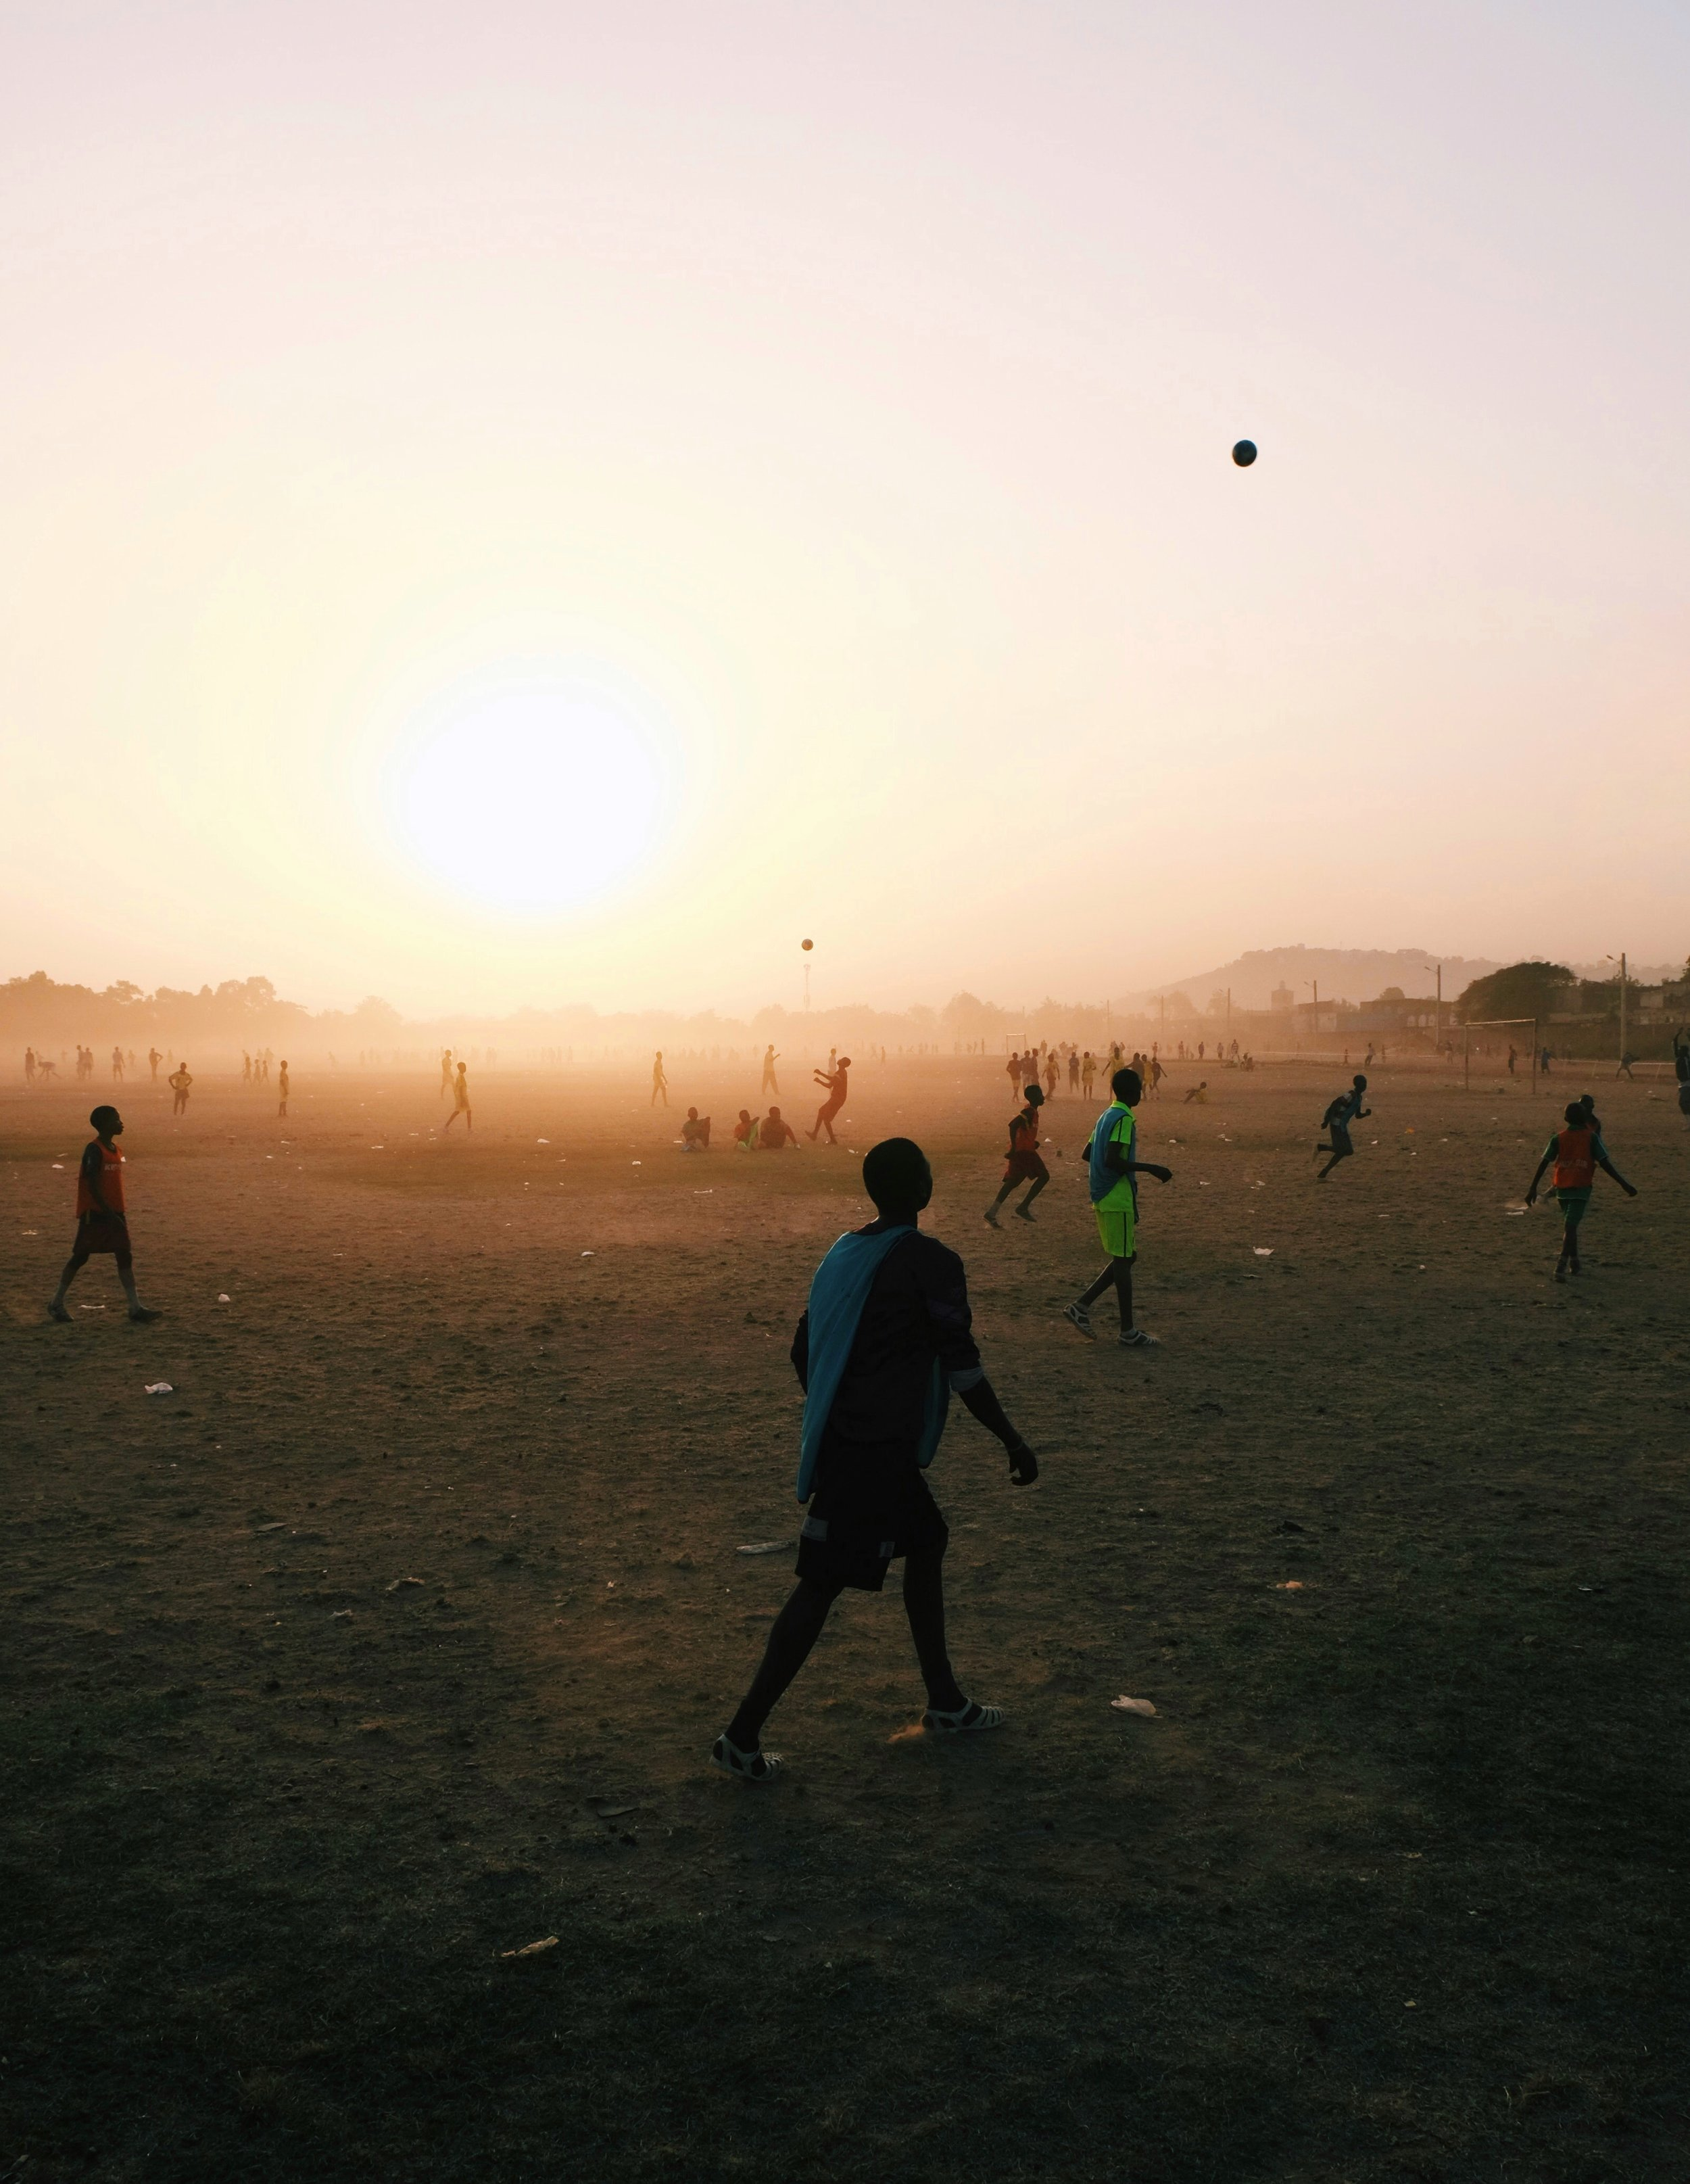 Soccer+at+Hippodrome+Bamako+by+Joost+Bastmeijer+in+Mali.jpeg